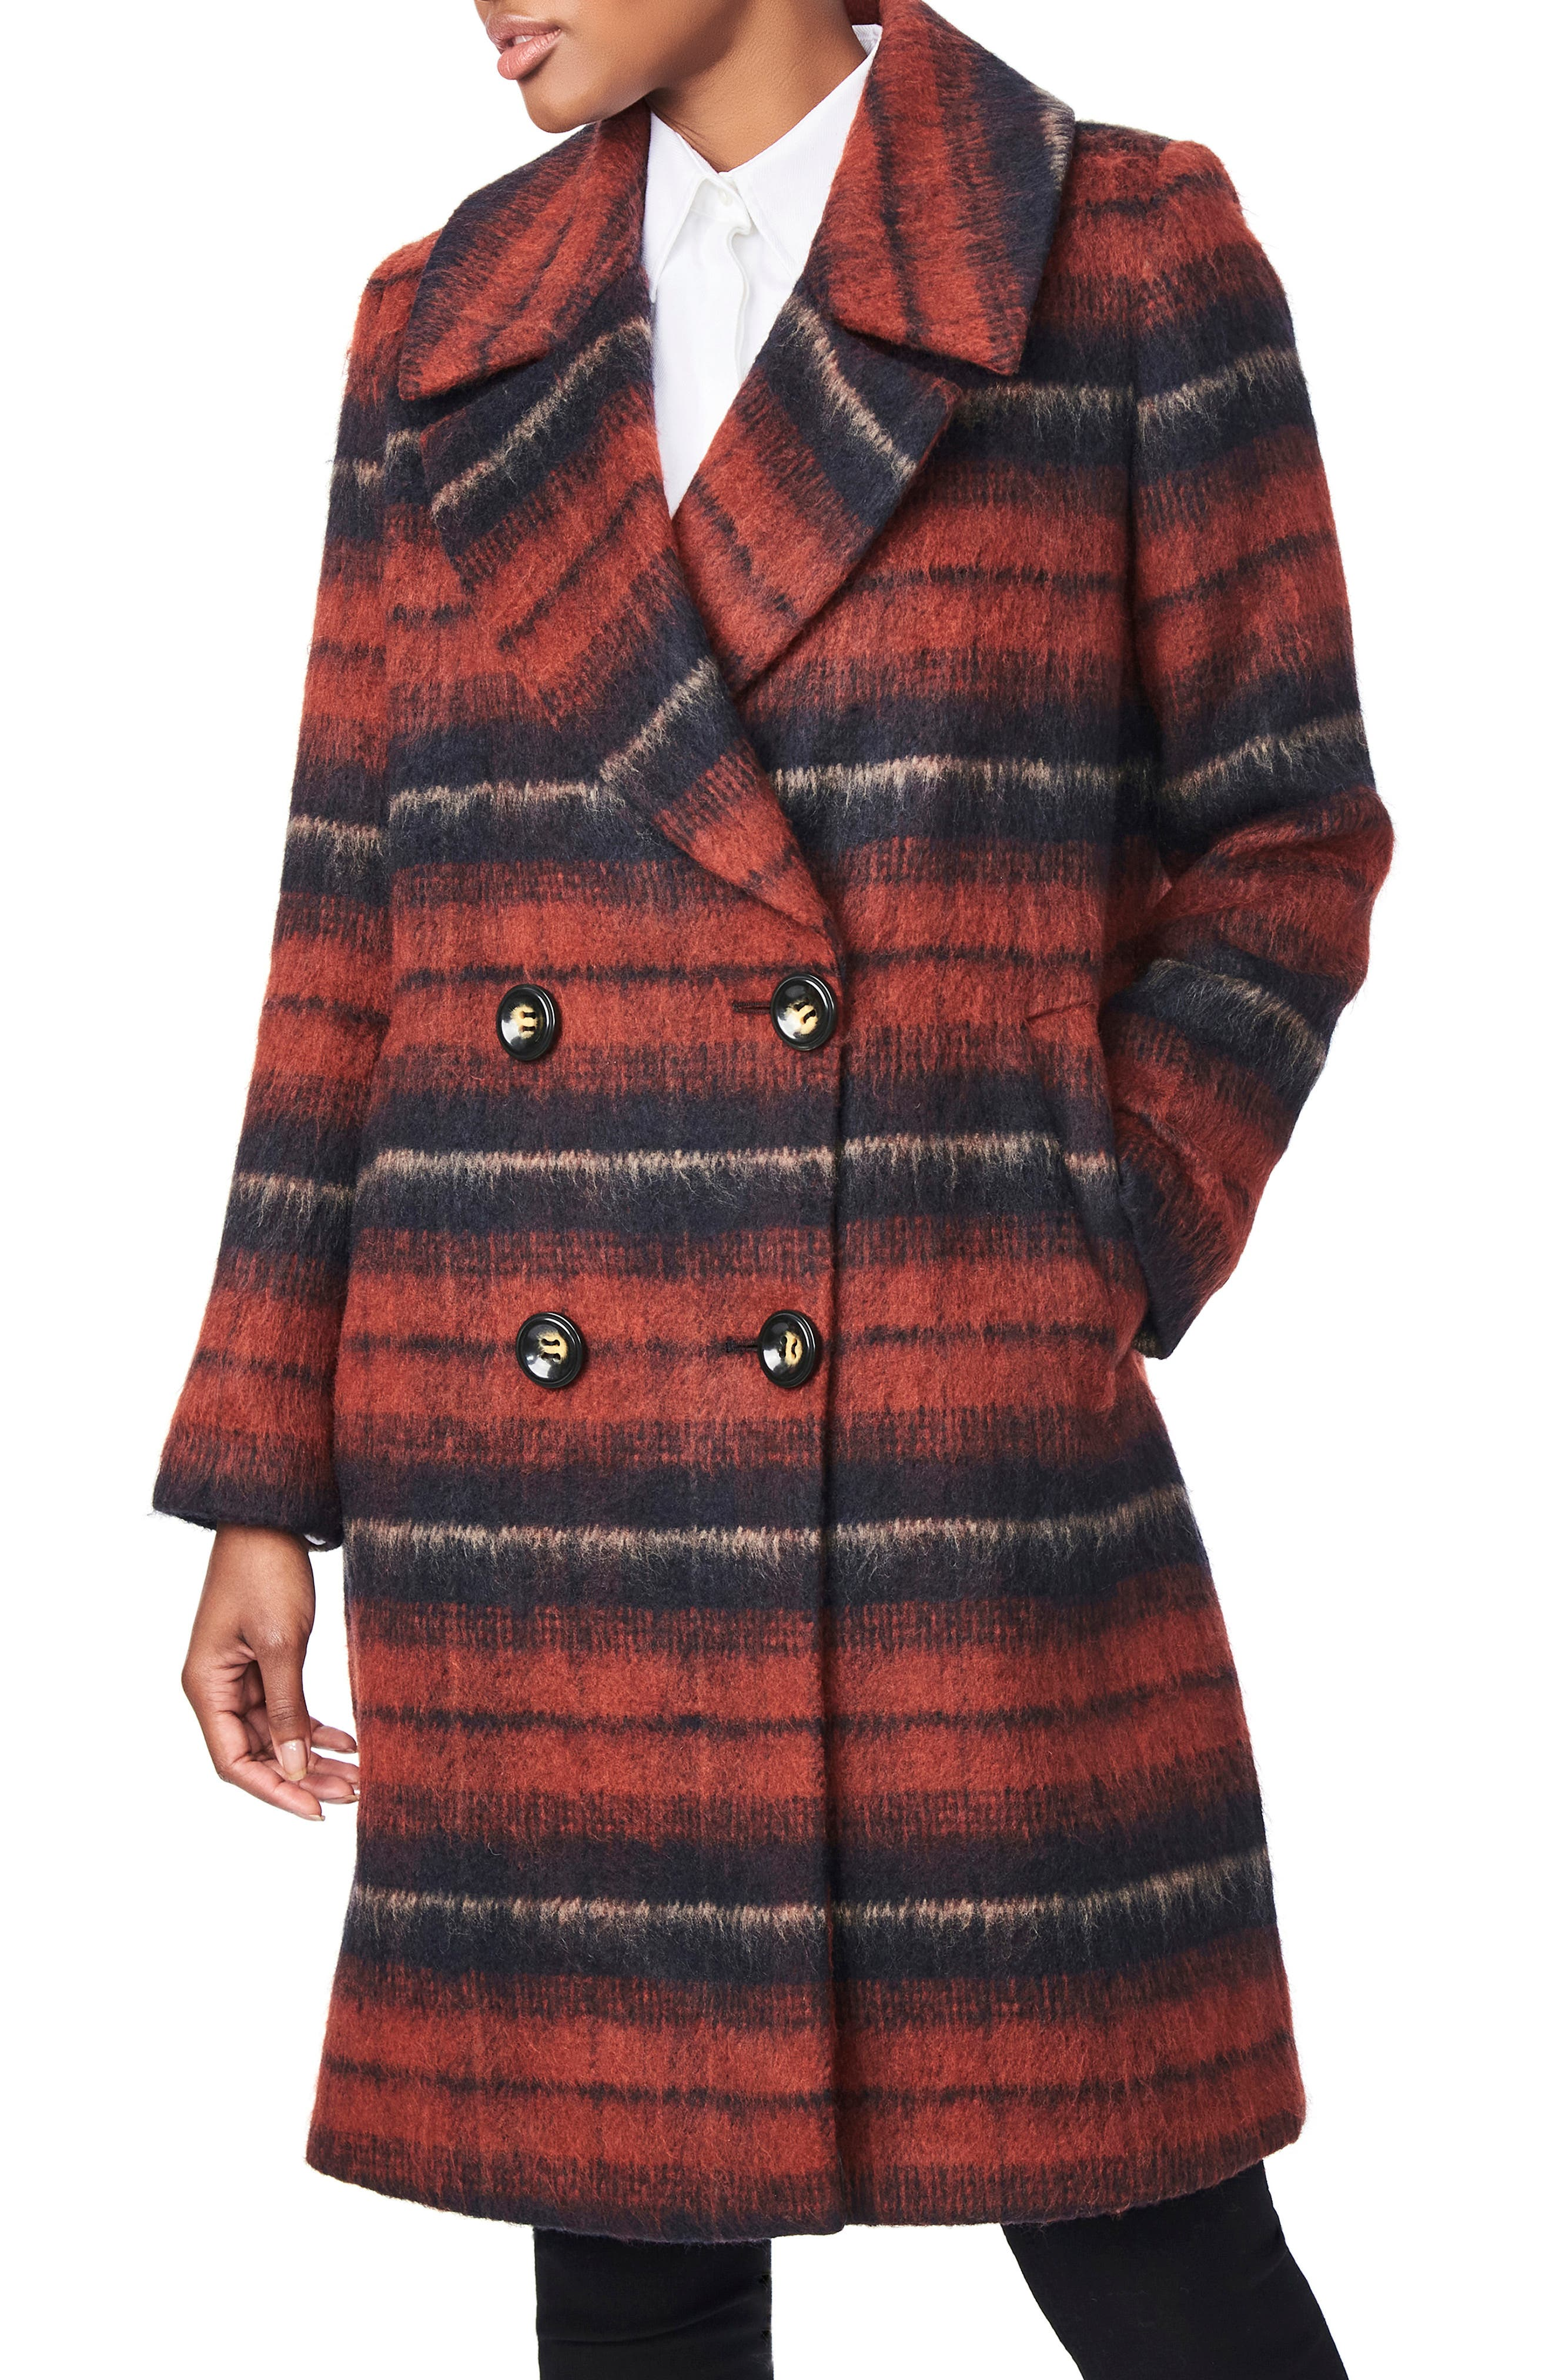 1940s Style Coats and Jackets for Sale Womens Bernardo Plaid Coat $149.90 AT vintagedancer.com